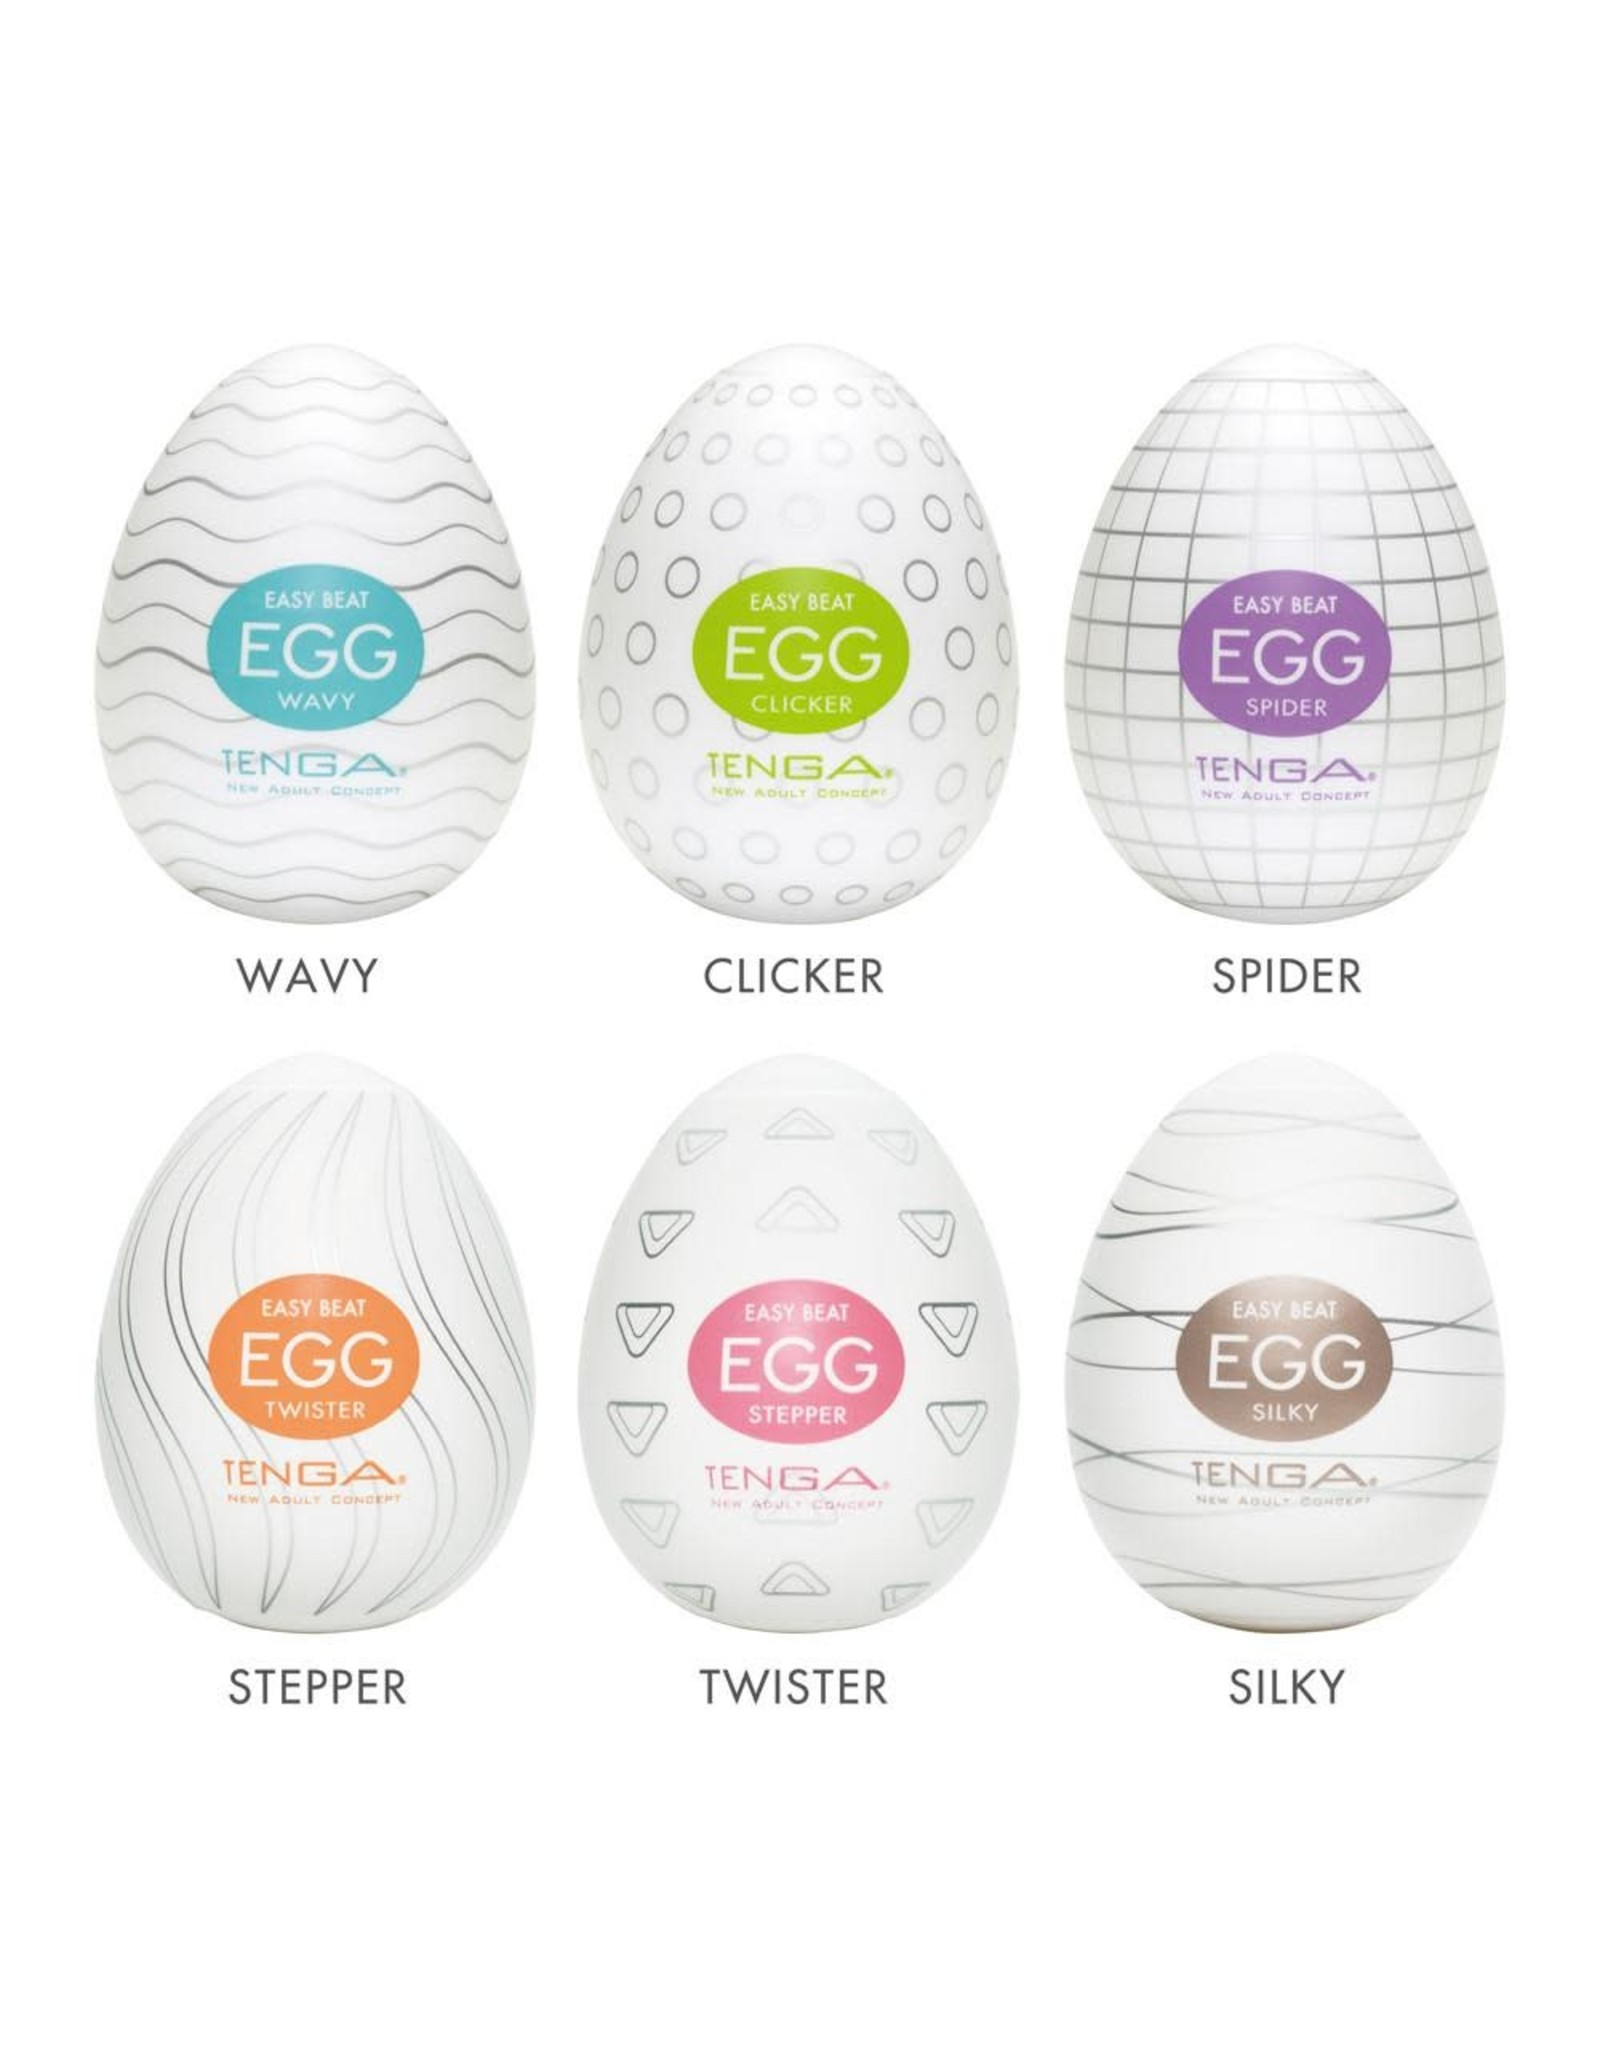 Tenga Tenga Egg Variety Pack - 6 Colors